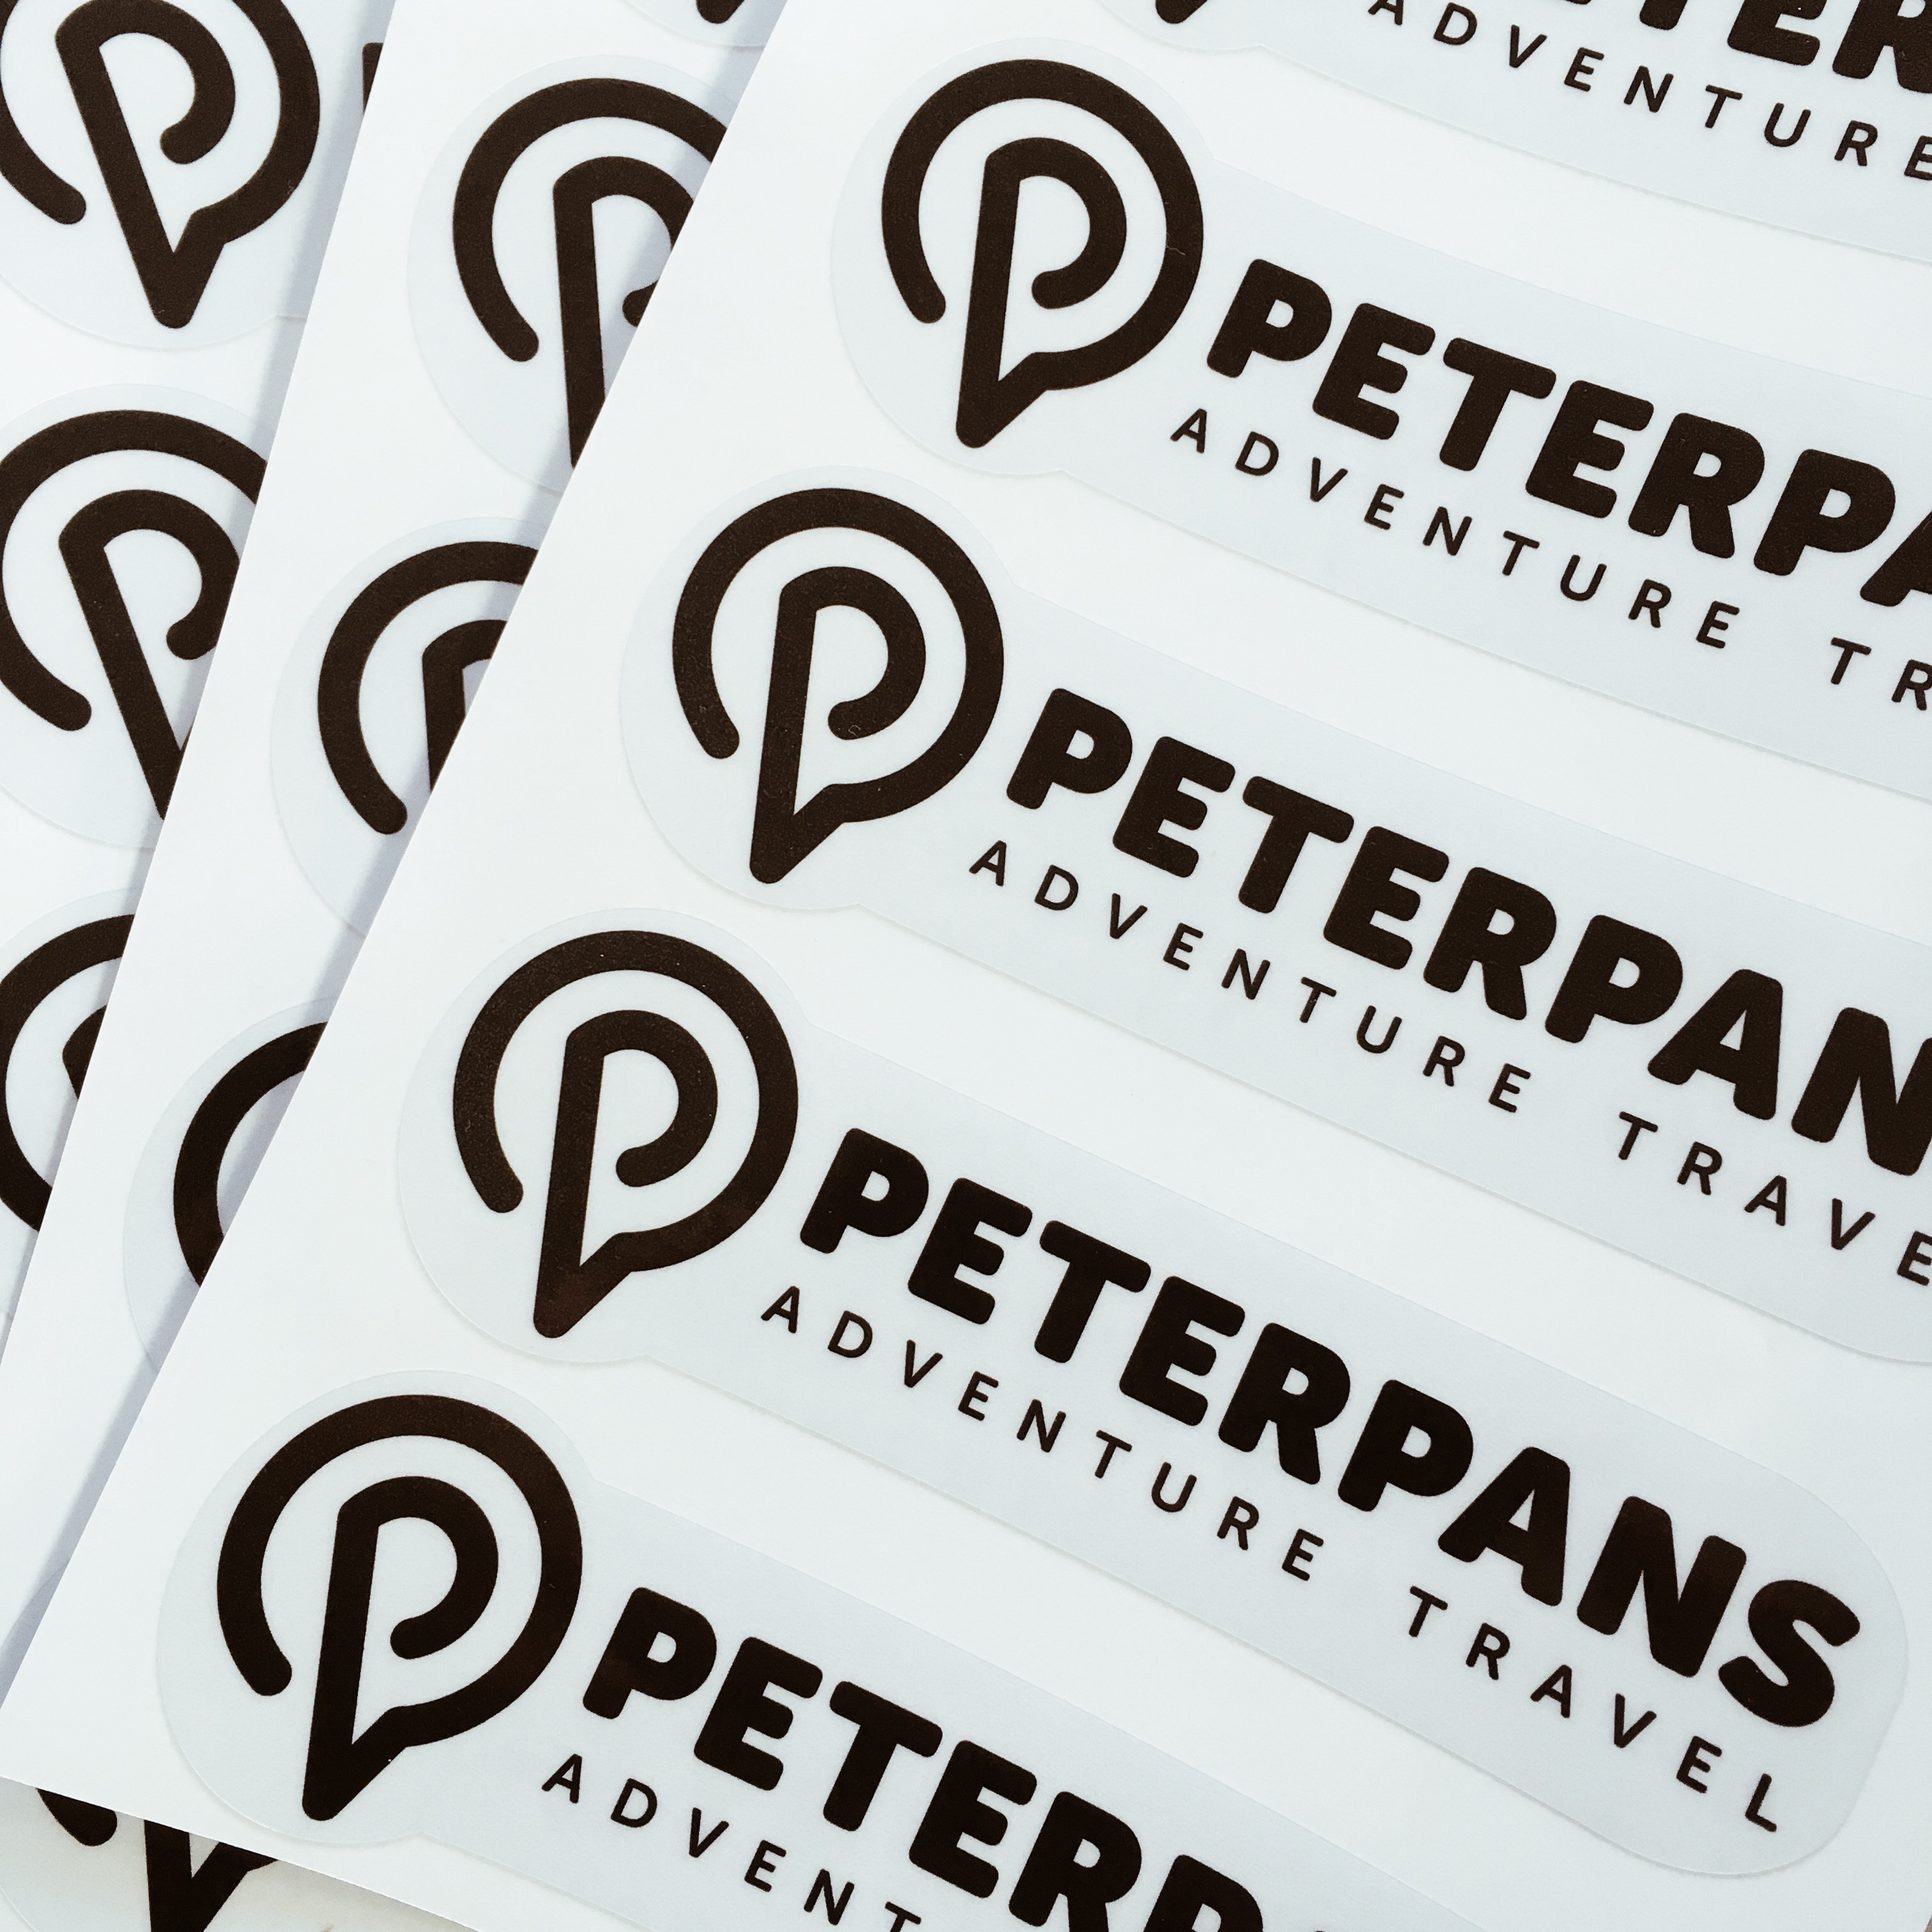 Peterpans